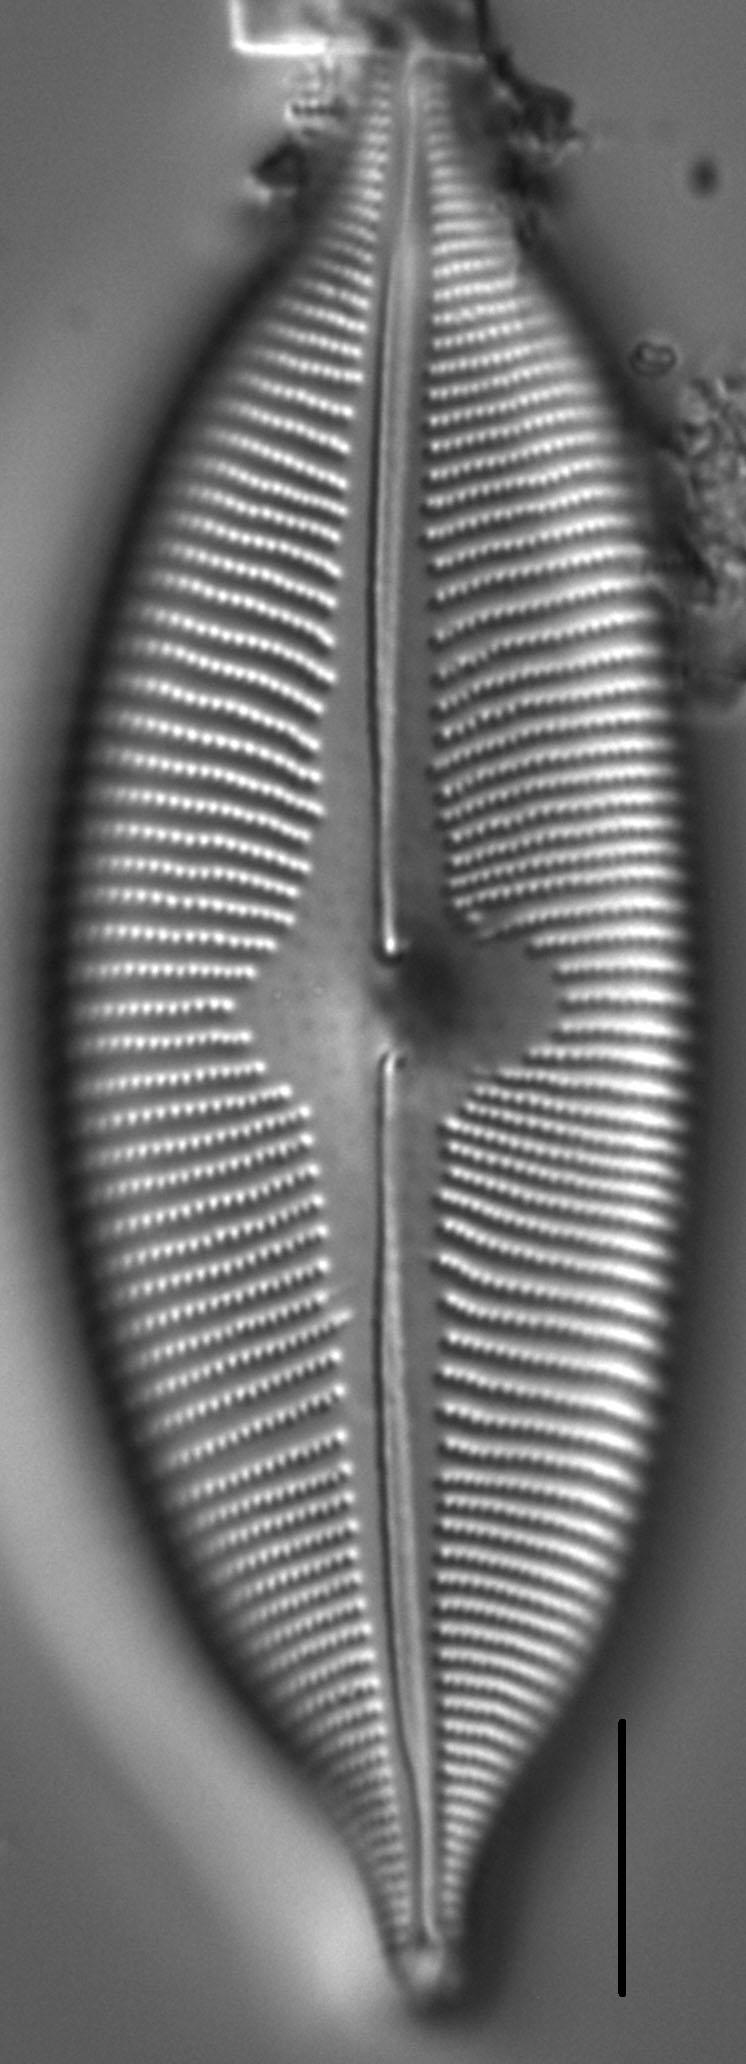 Cymboapiculata5